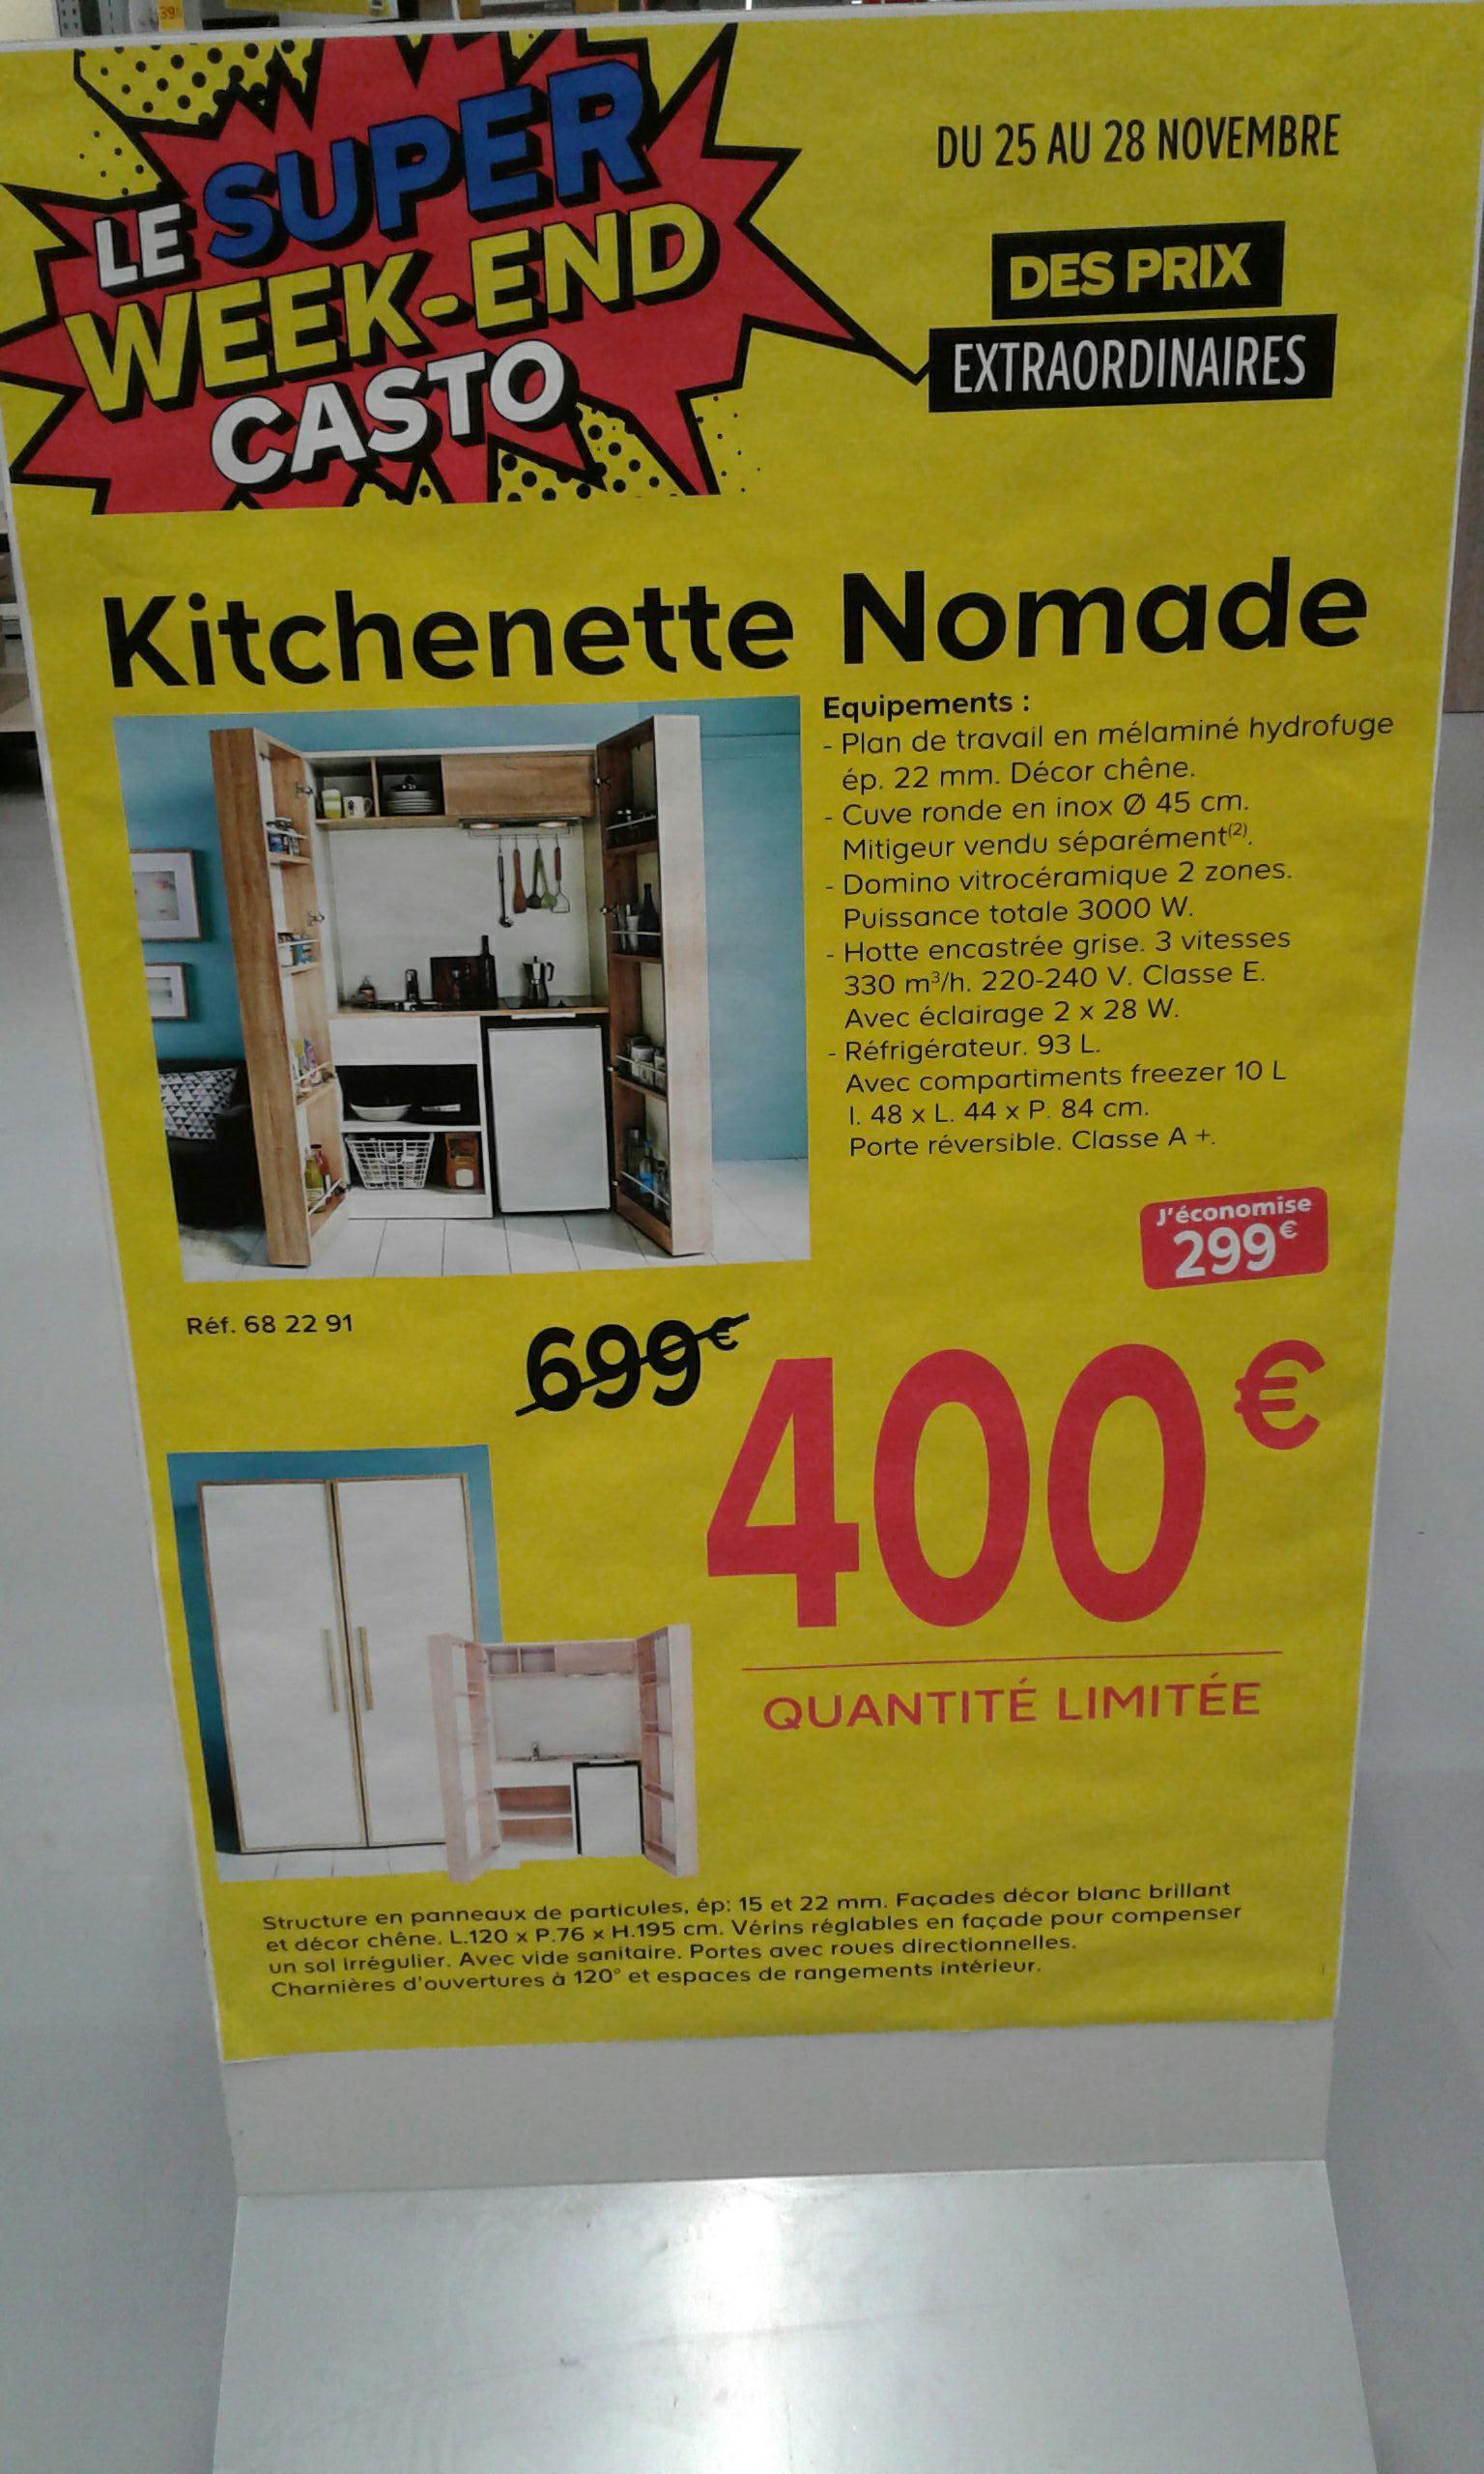 Kitchenette nomade